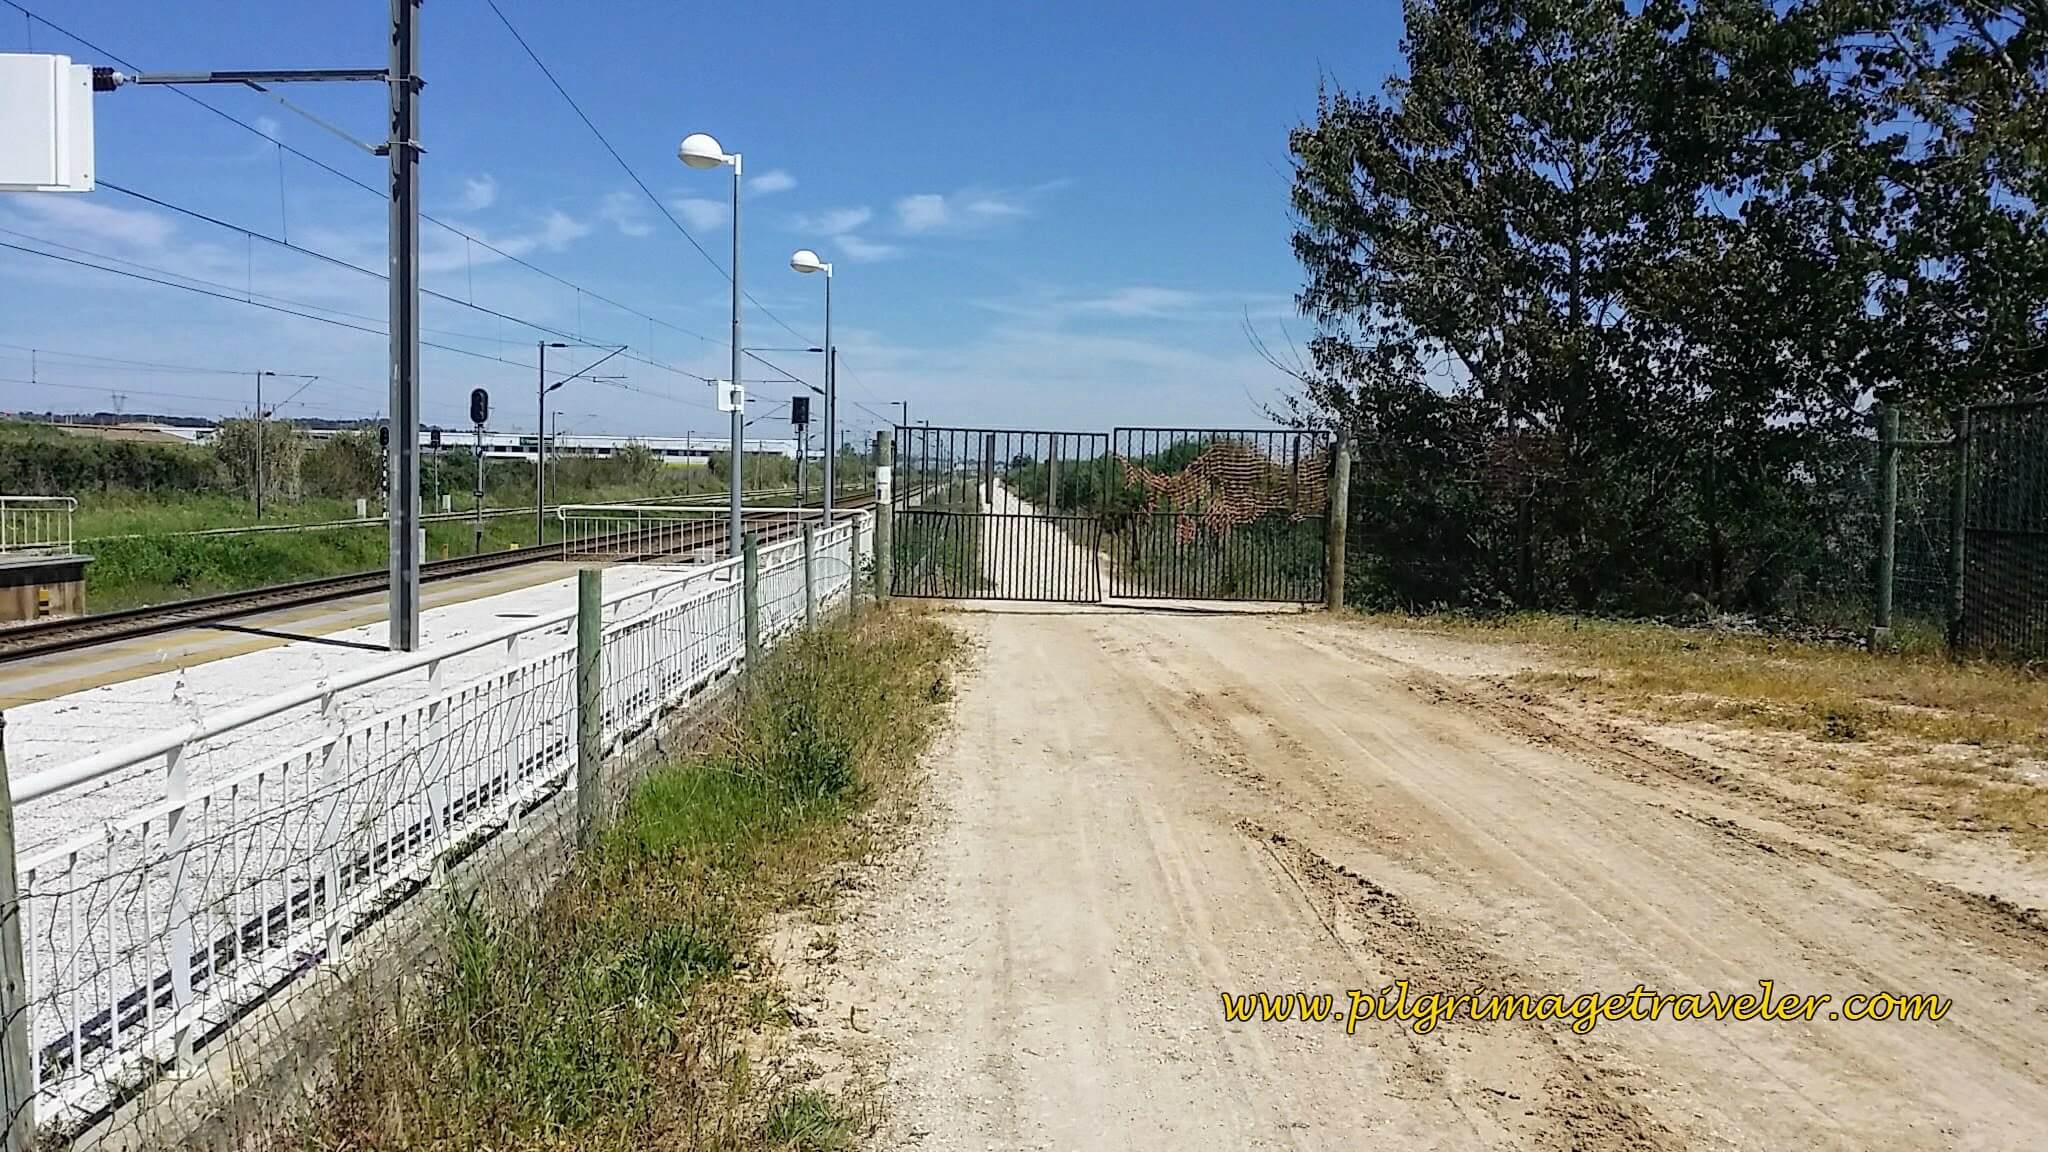 Gate on Sandy Track towards Azambuja, Portugal